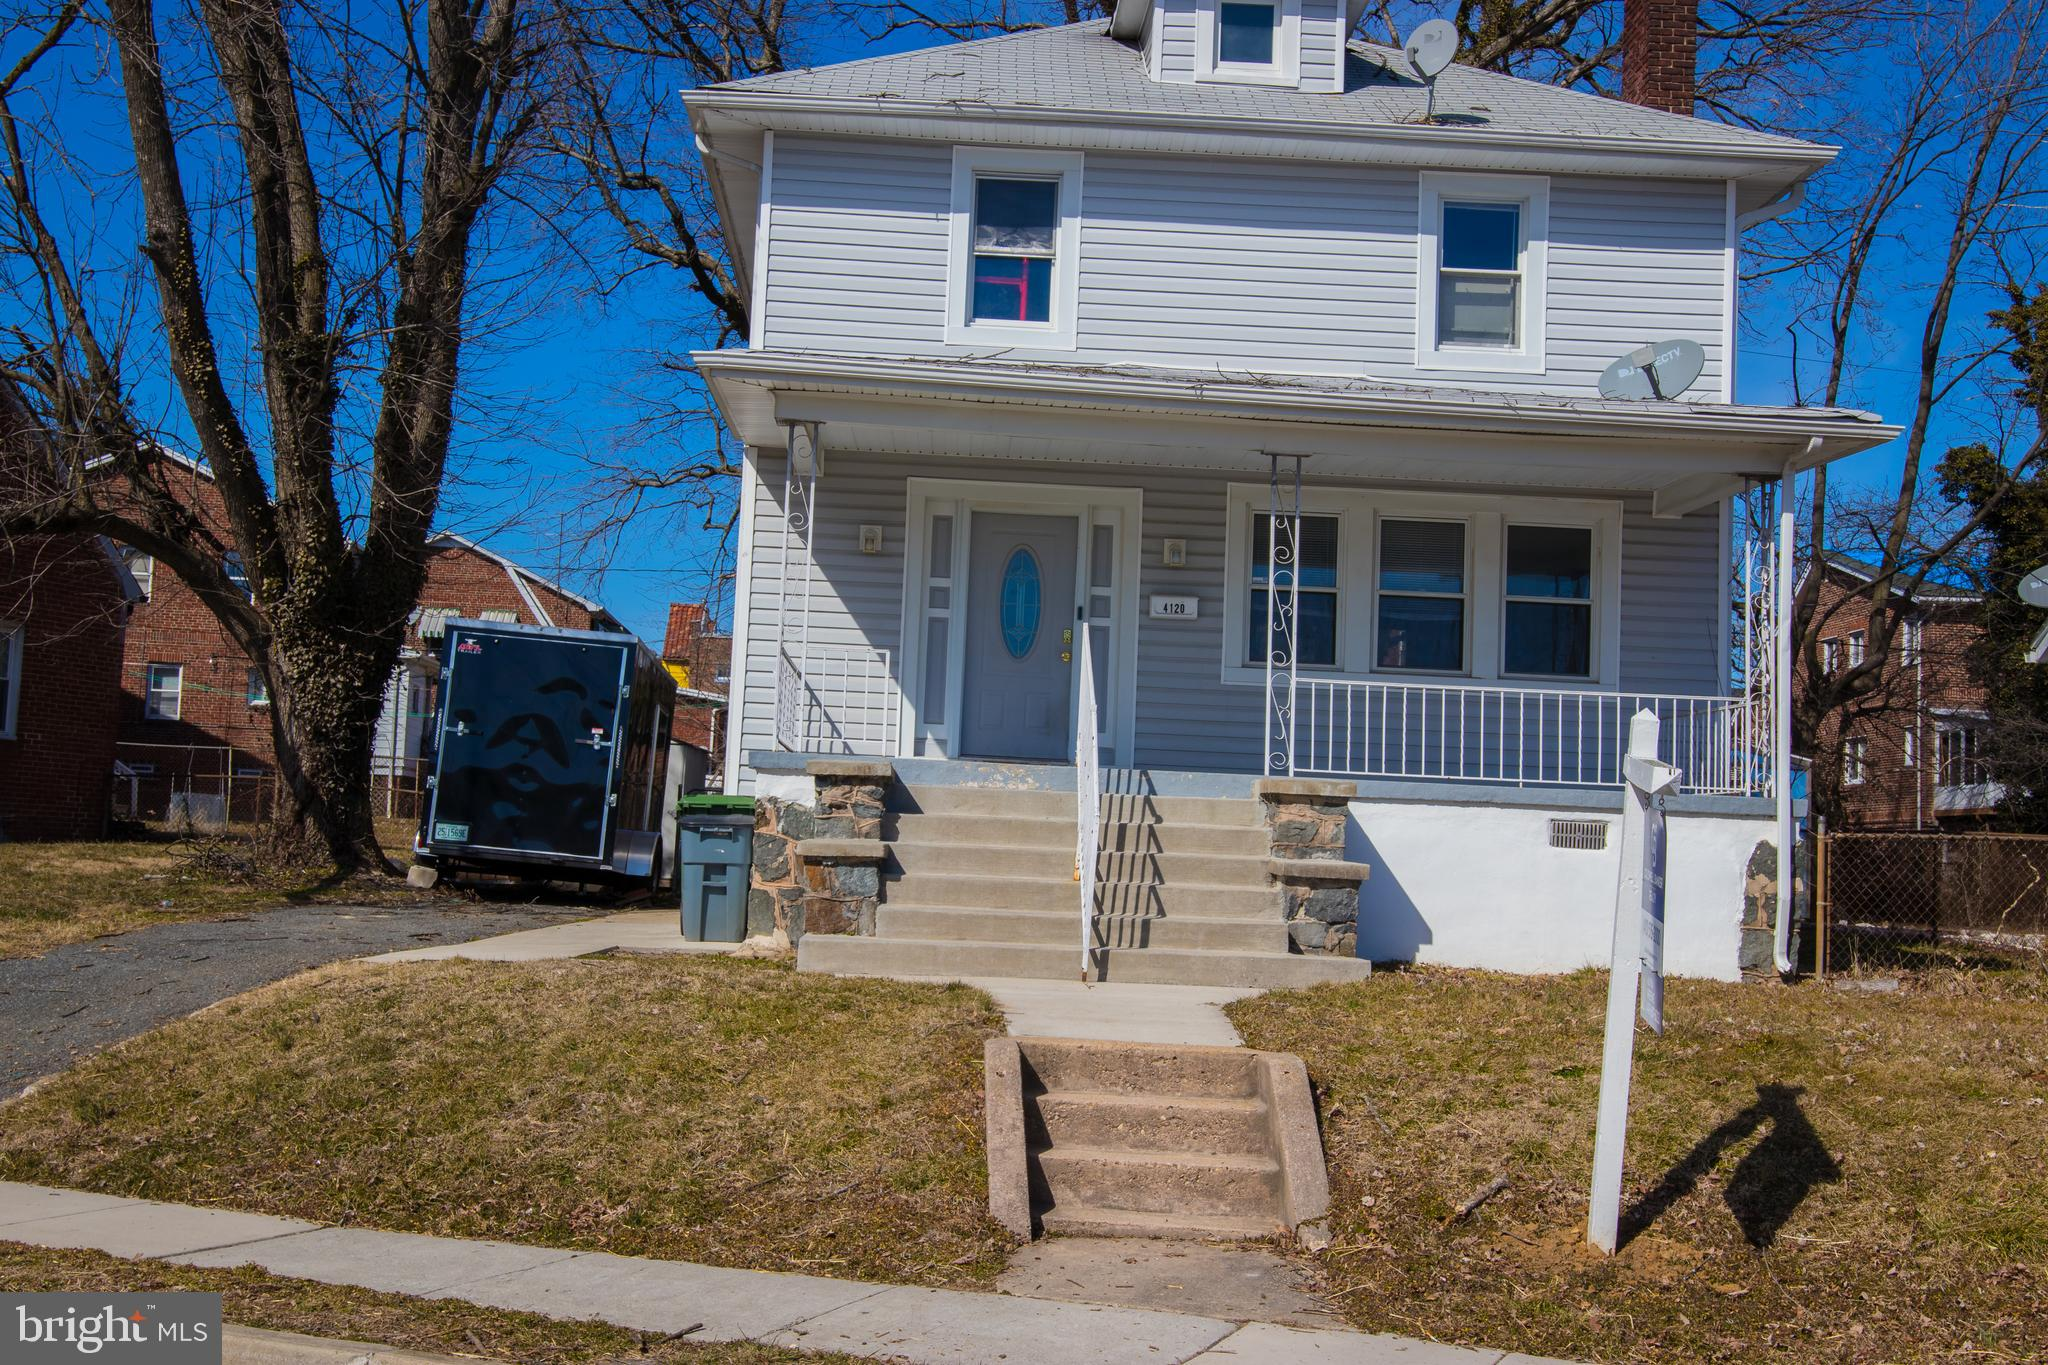 4120 BELLE AVENUE, BALTIMORE, Maryland 21215, 3 Bedrooms Bedrooms, ,3 BathroomsBathrooms,Single Family,For Sale,4120 BELLE AVENUE,MDBA539442